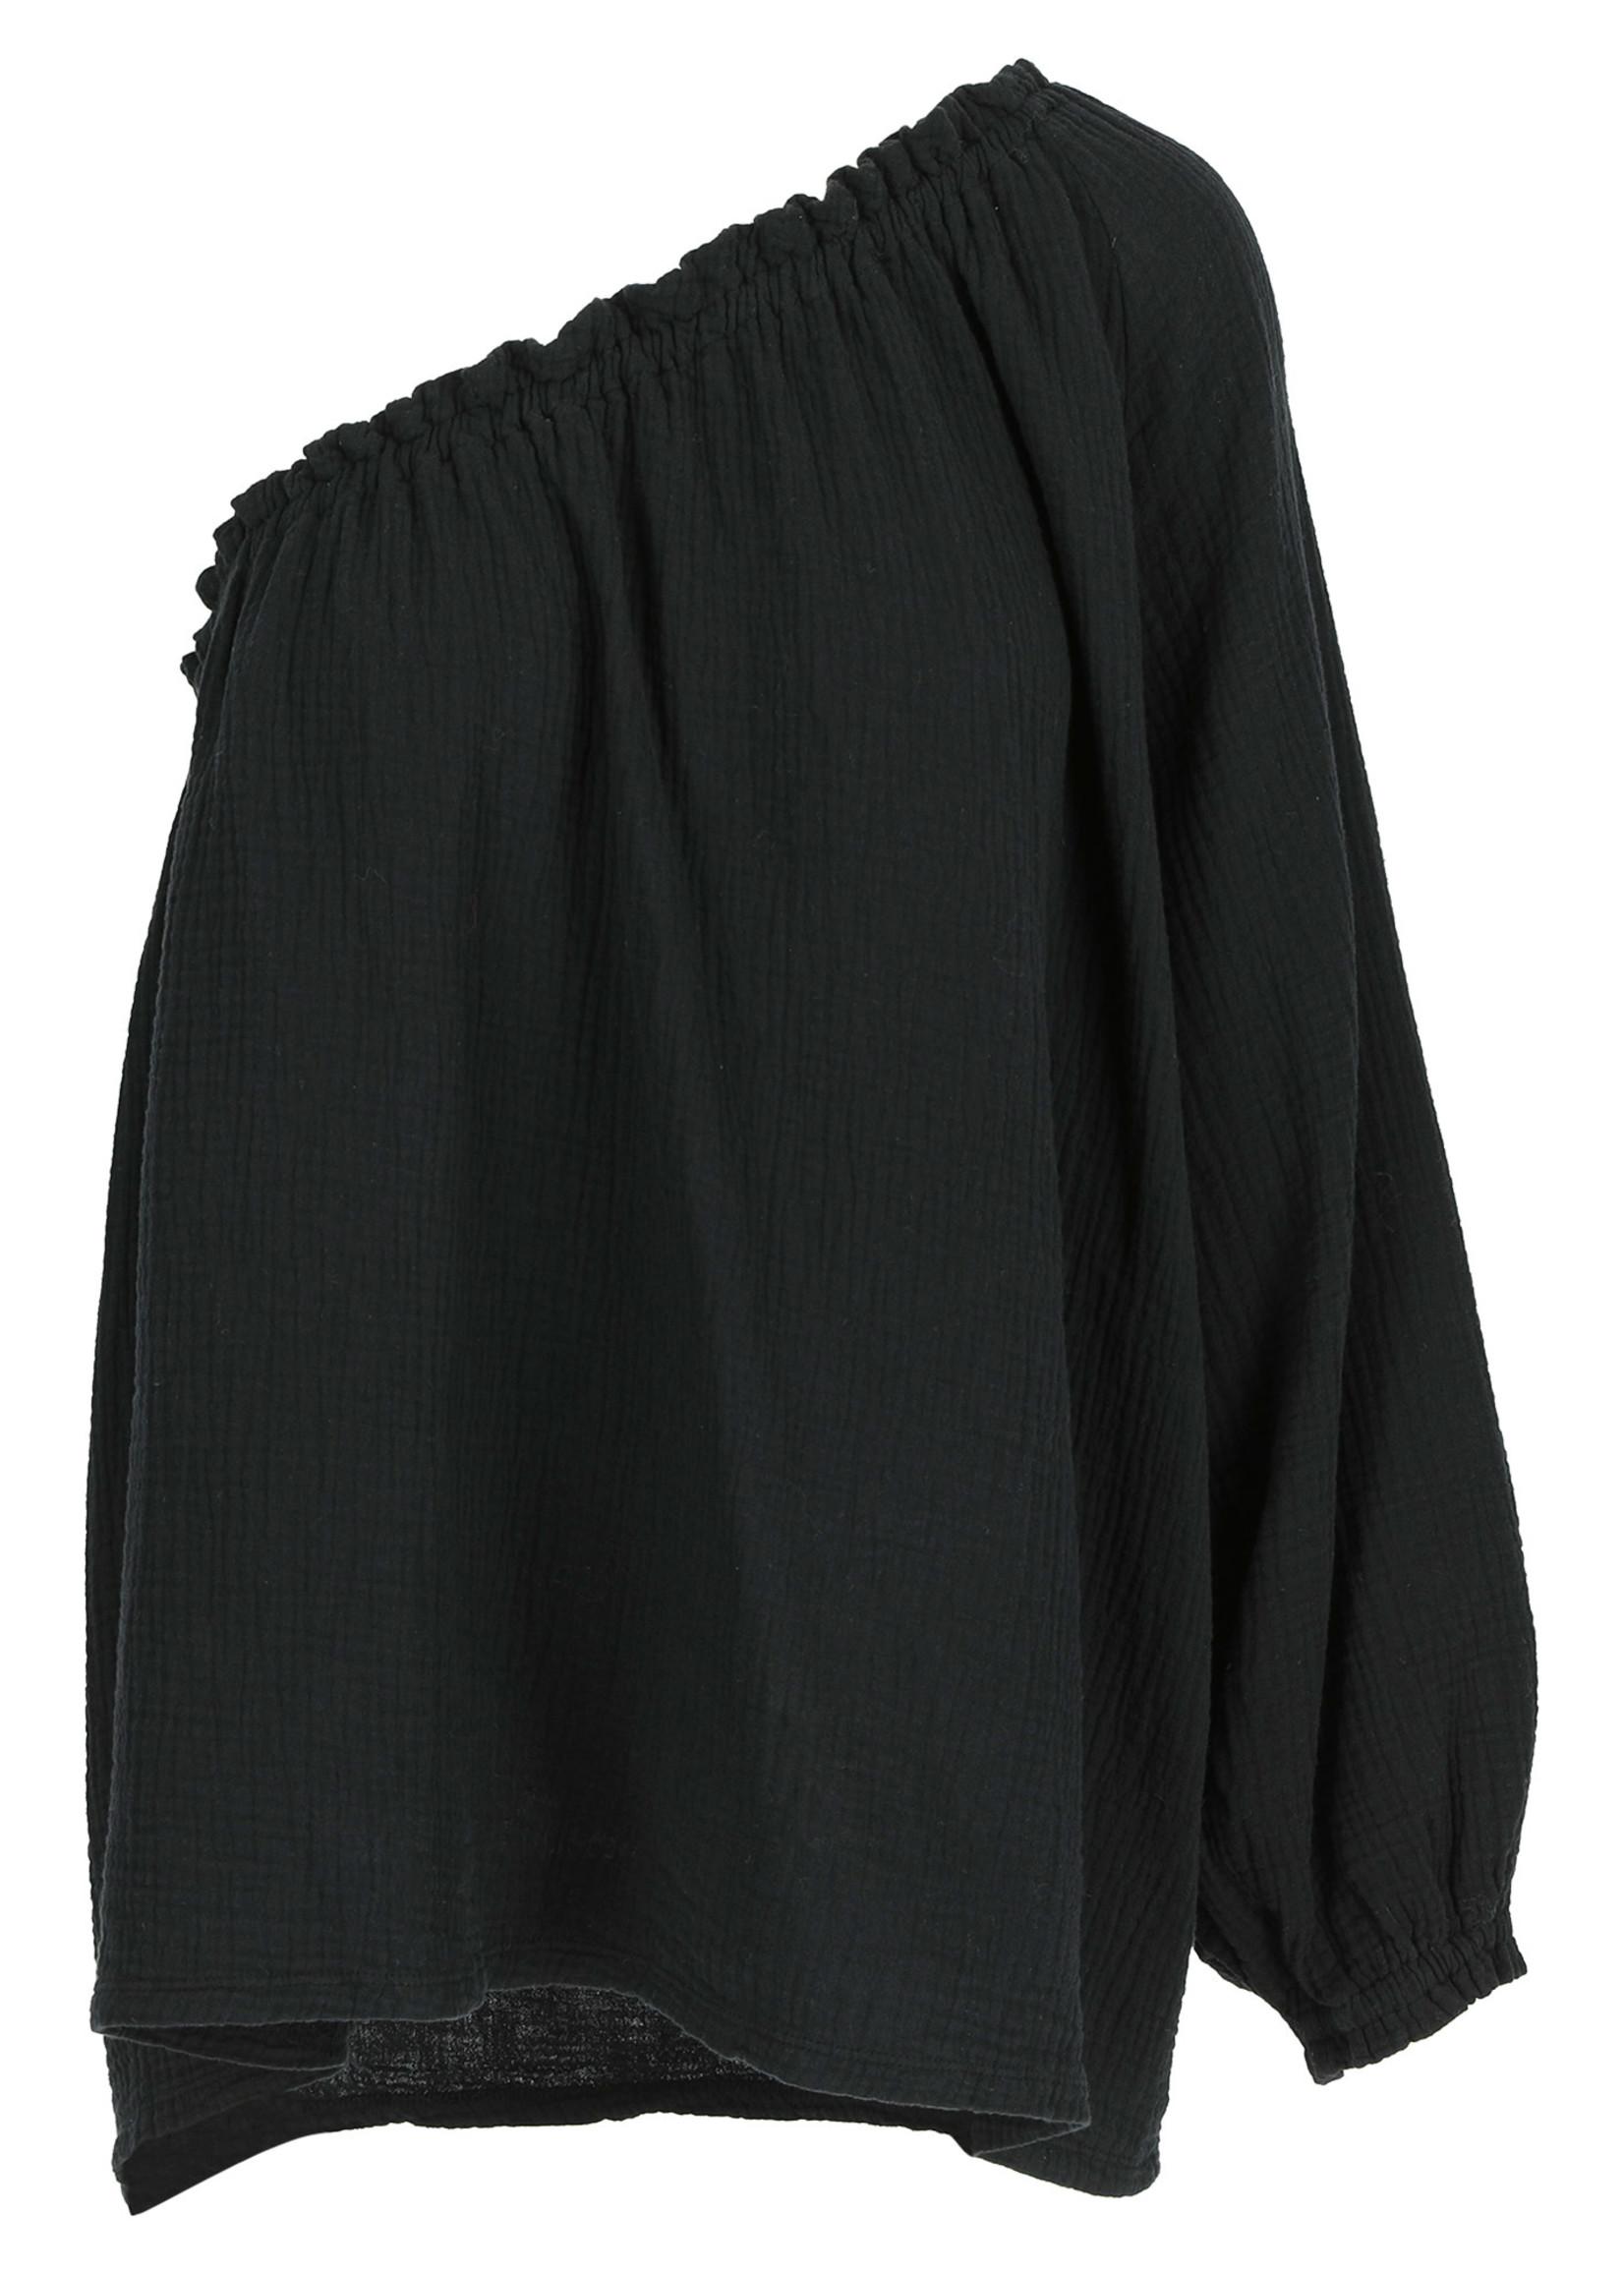 Heavenly Bali Black One Size SS20